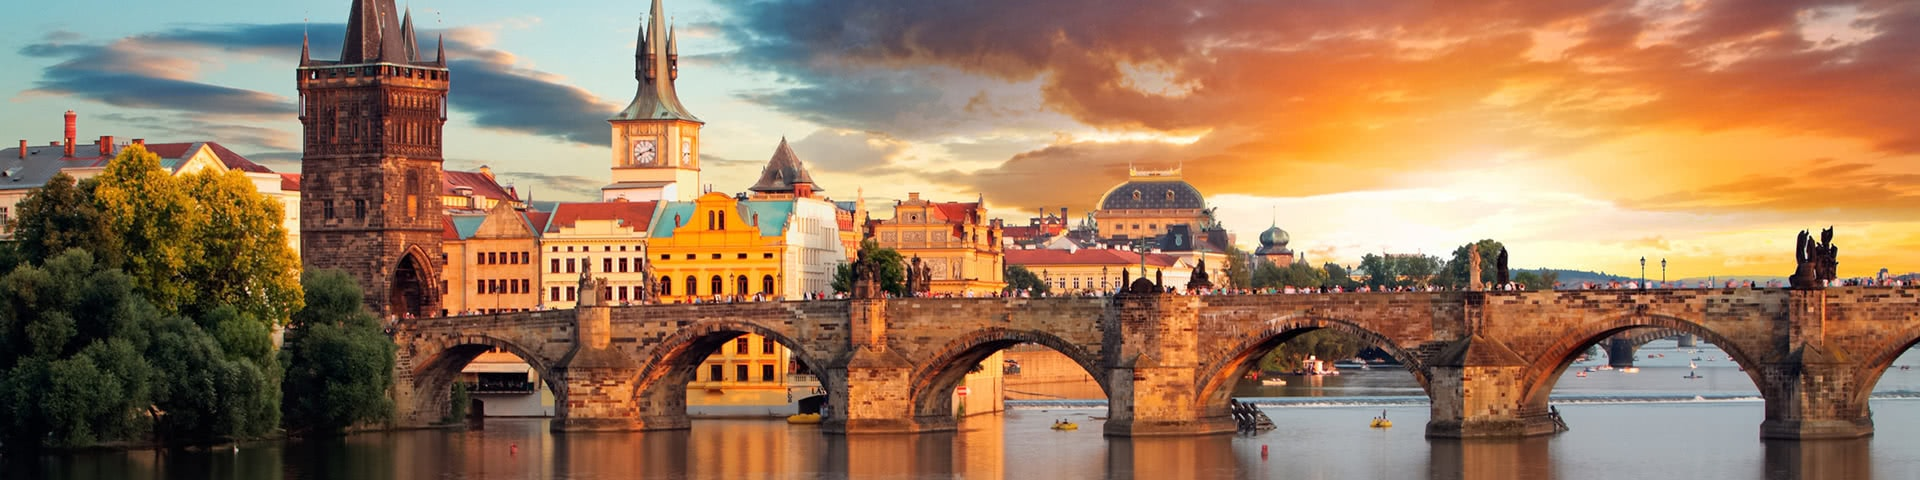 Karlsbrück in Prag bei Sonnenuntergang